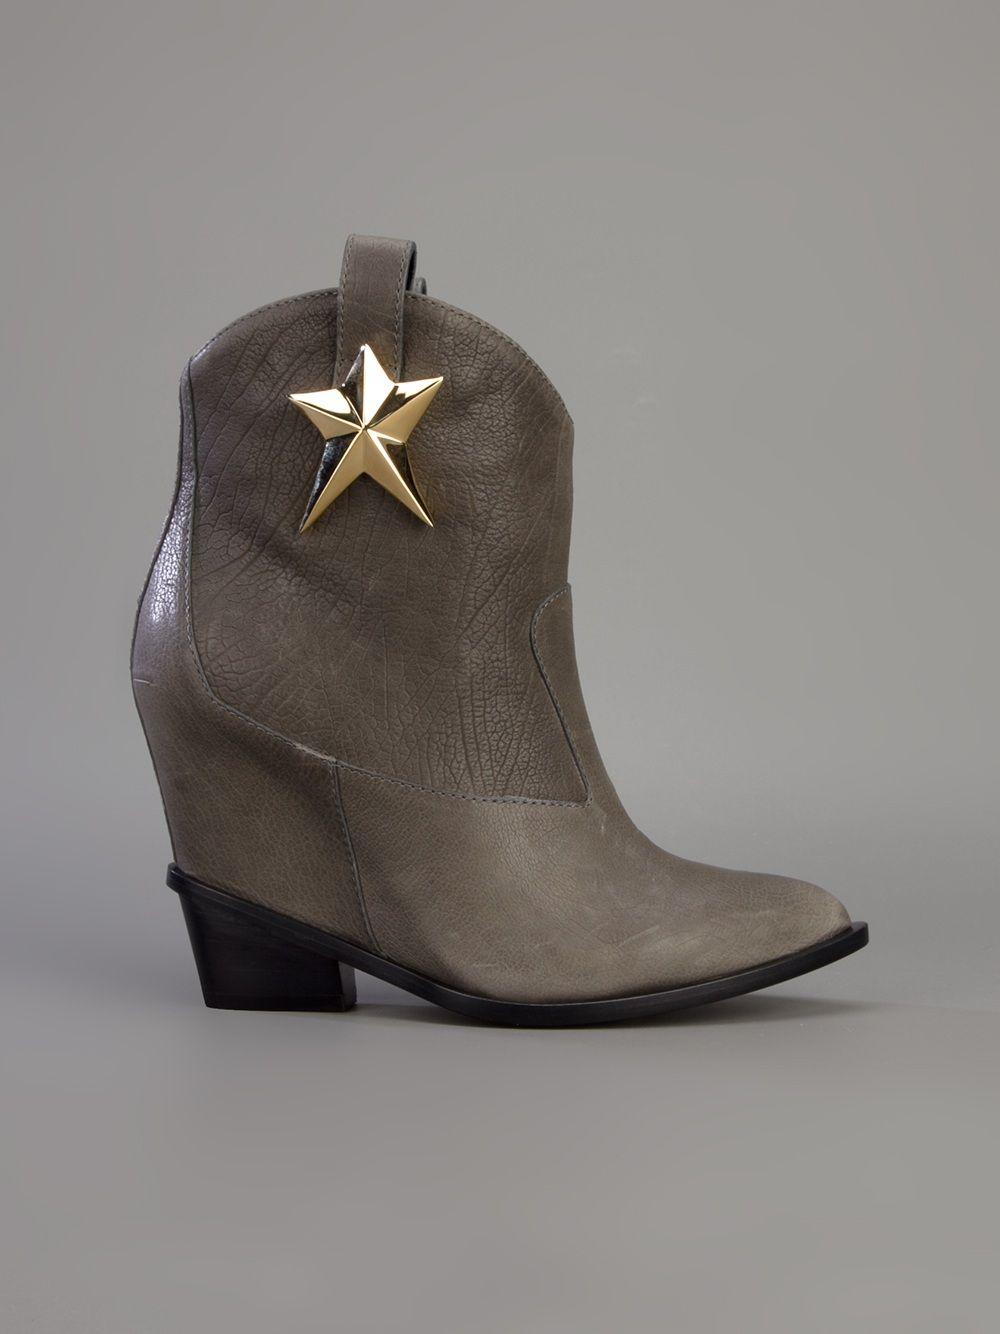 Giuseppe Zanotti Design - star motif cowboy boot 7